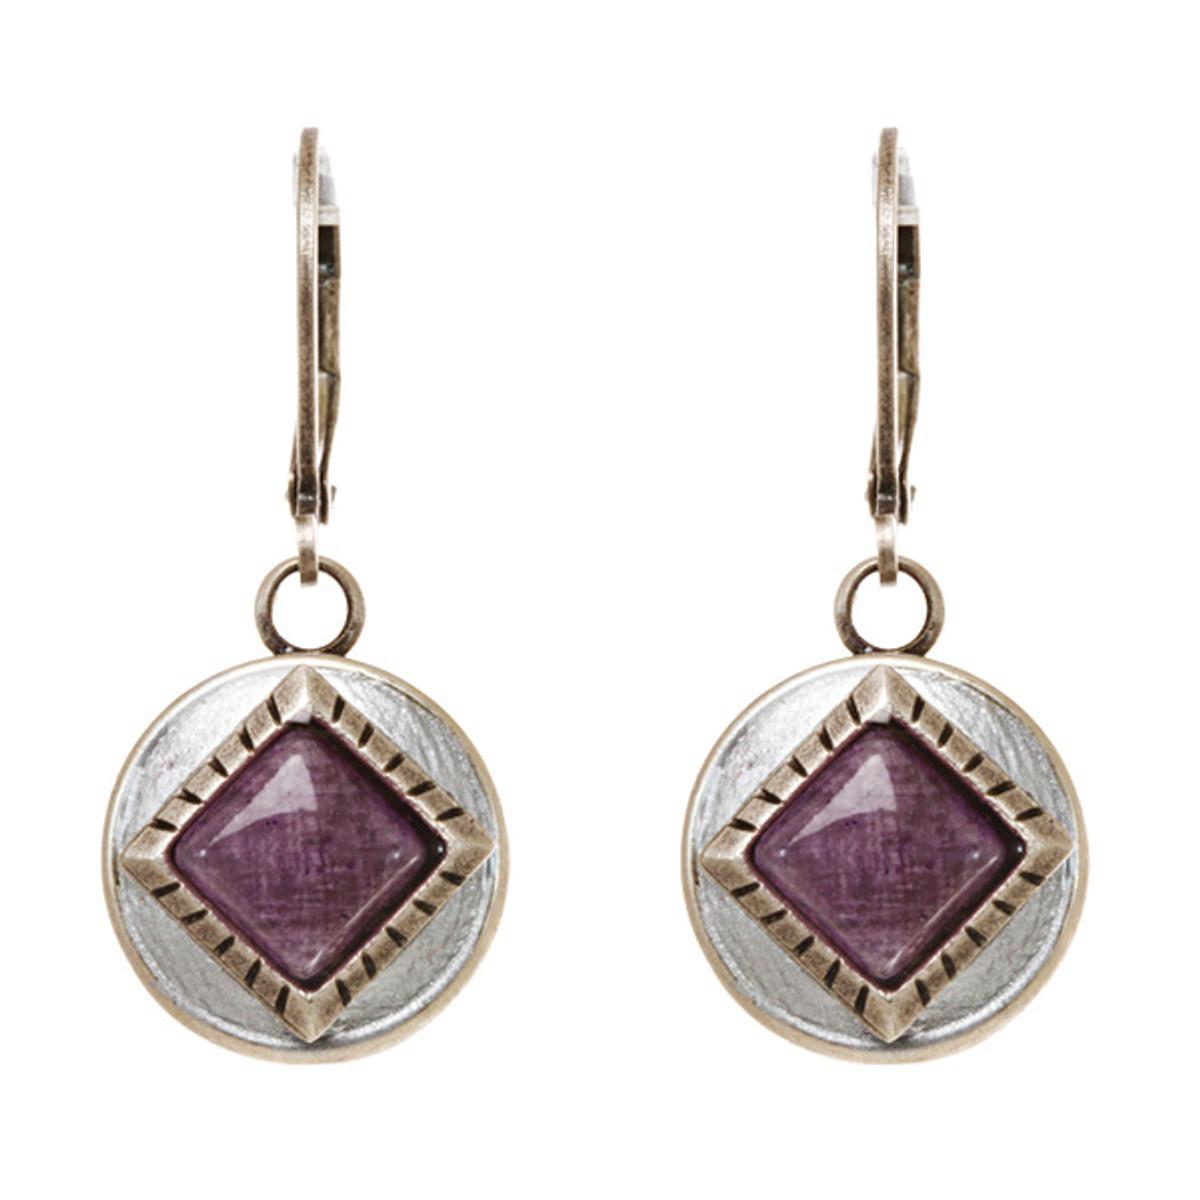 Golan Jewelry Tranquility Earrings